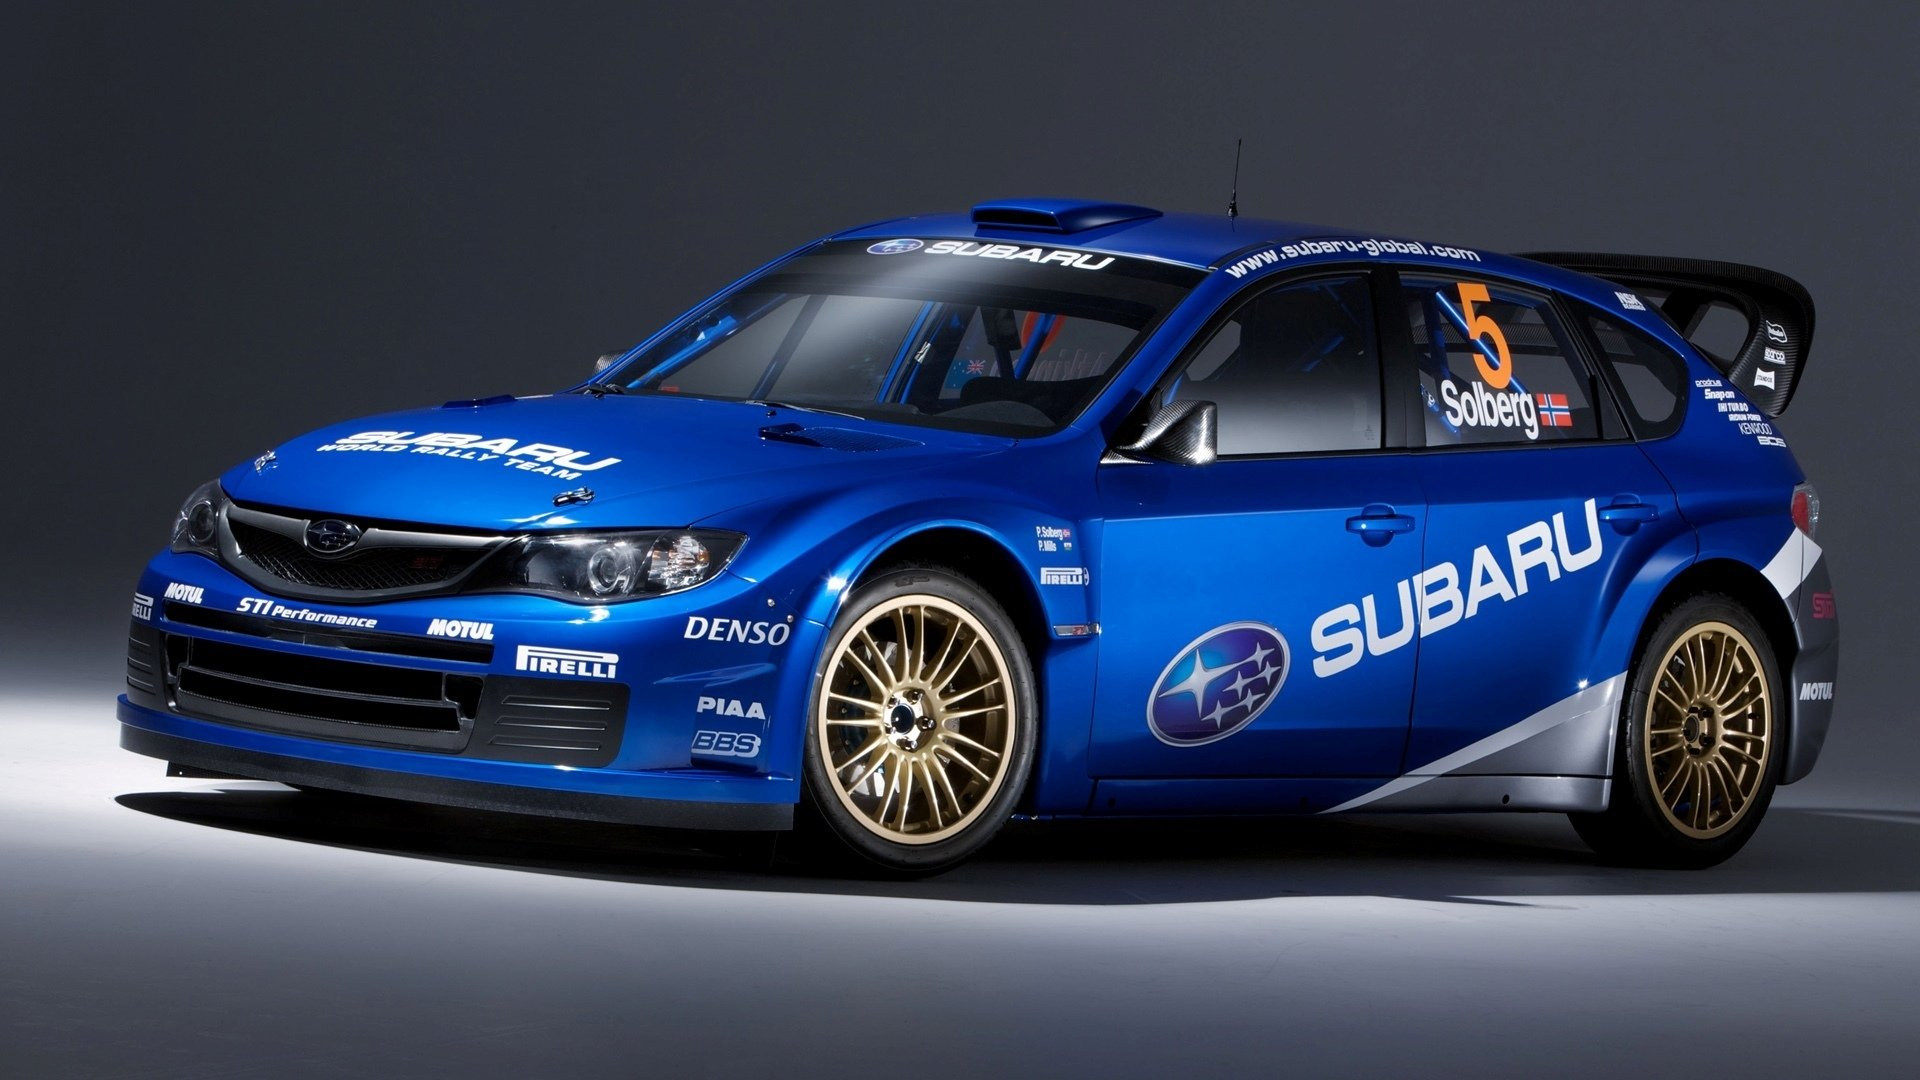 Subaru Rally Car Wallpaper Wallpapersafari